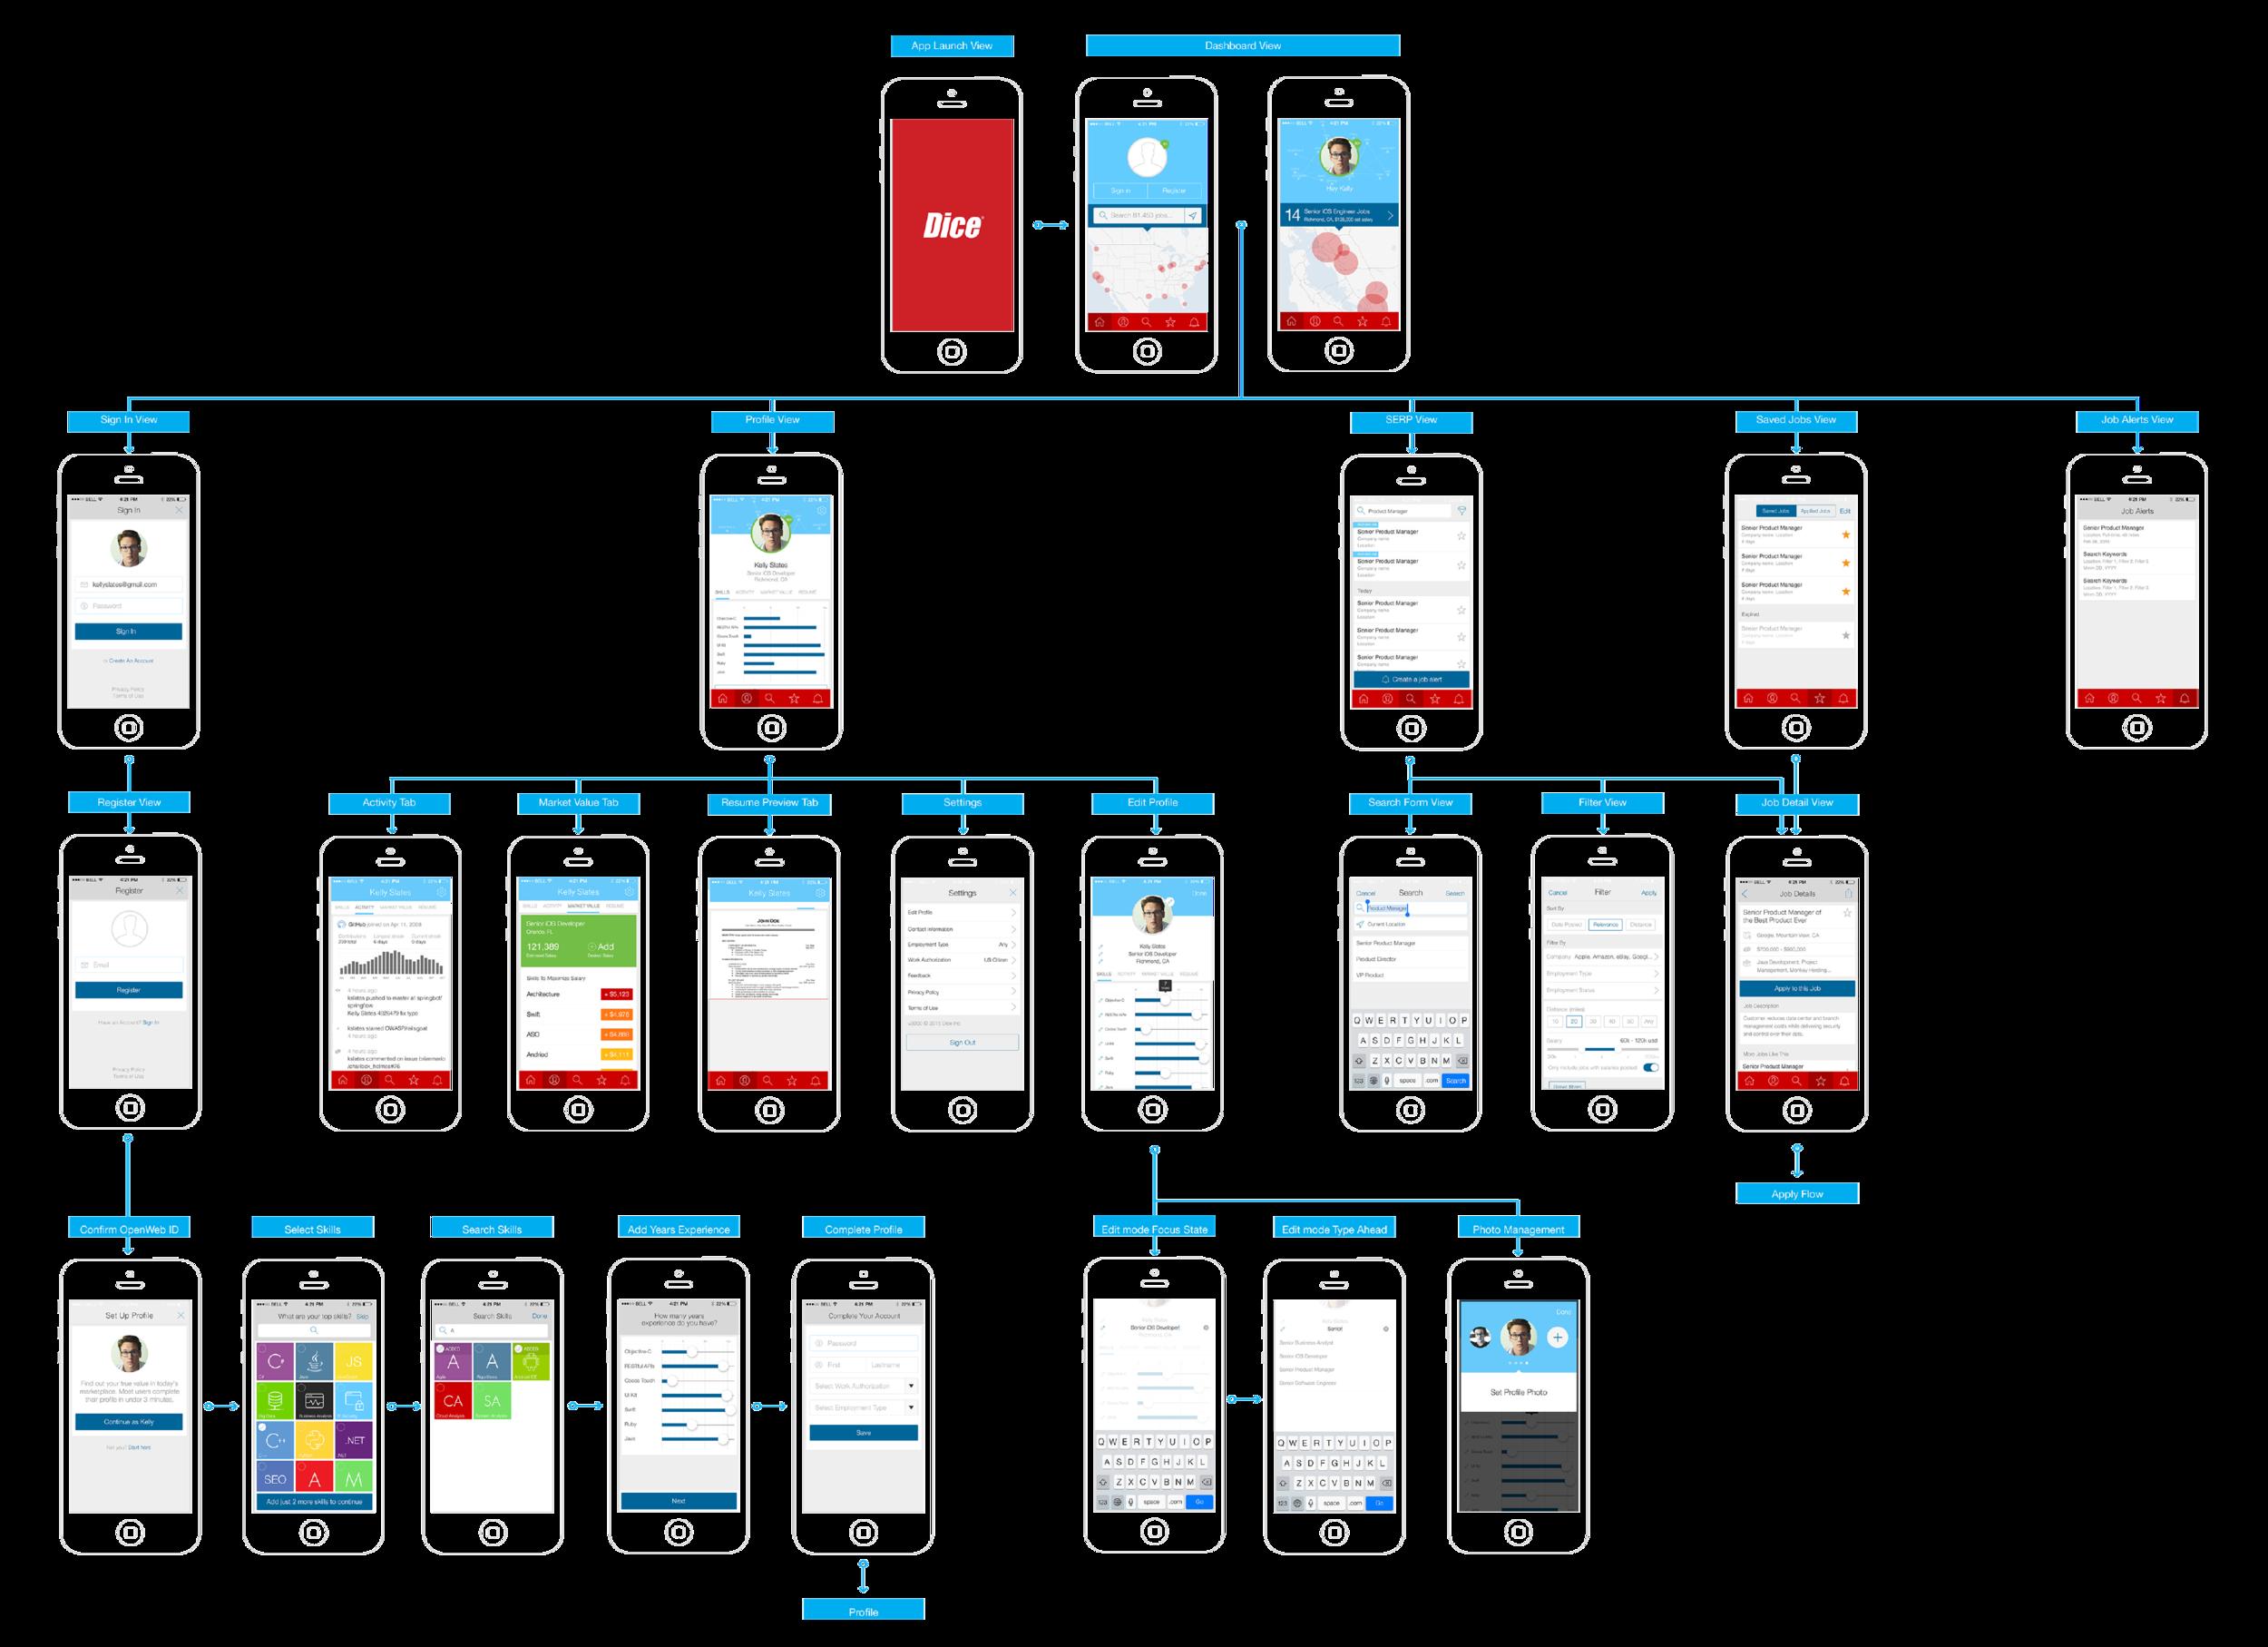 dice_user-flow_mobile_app2.png